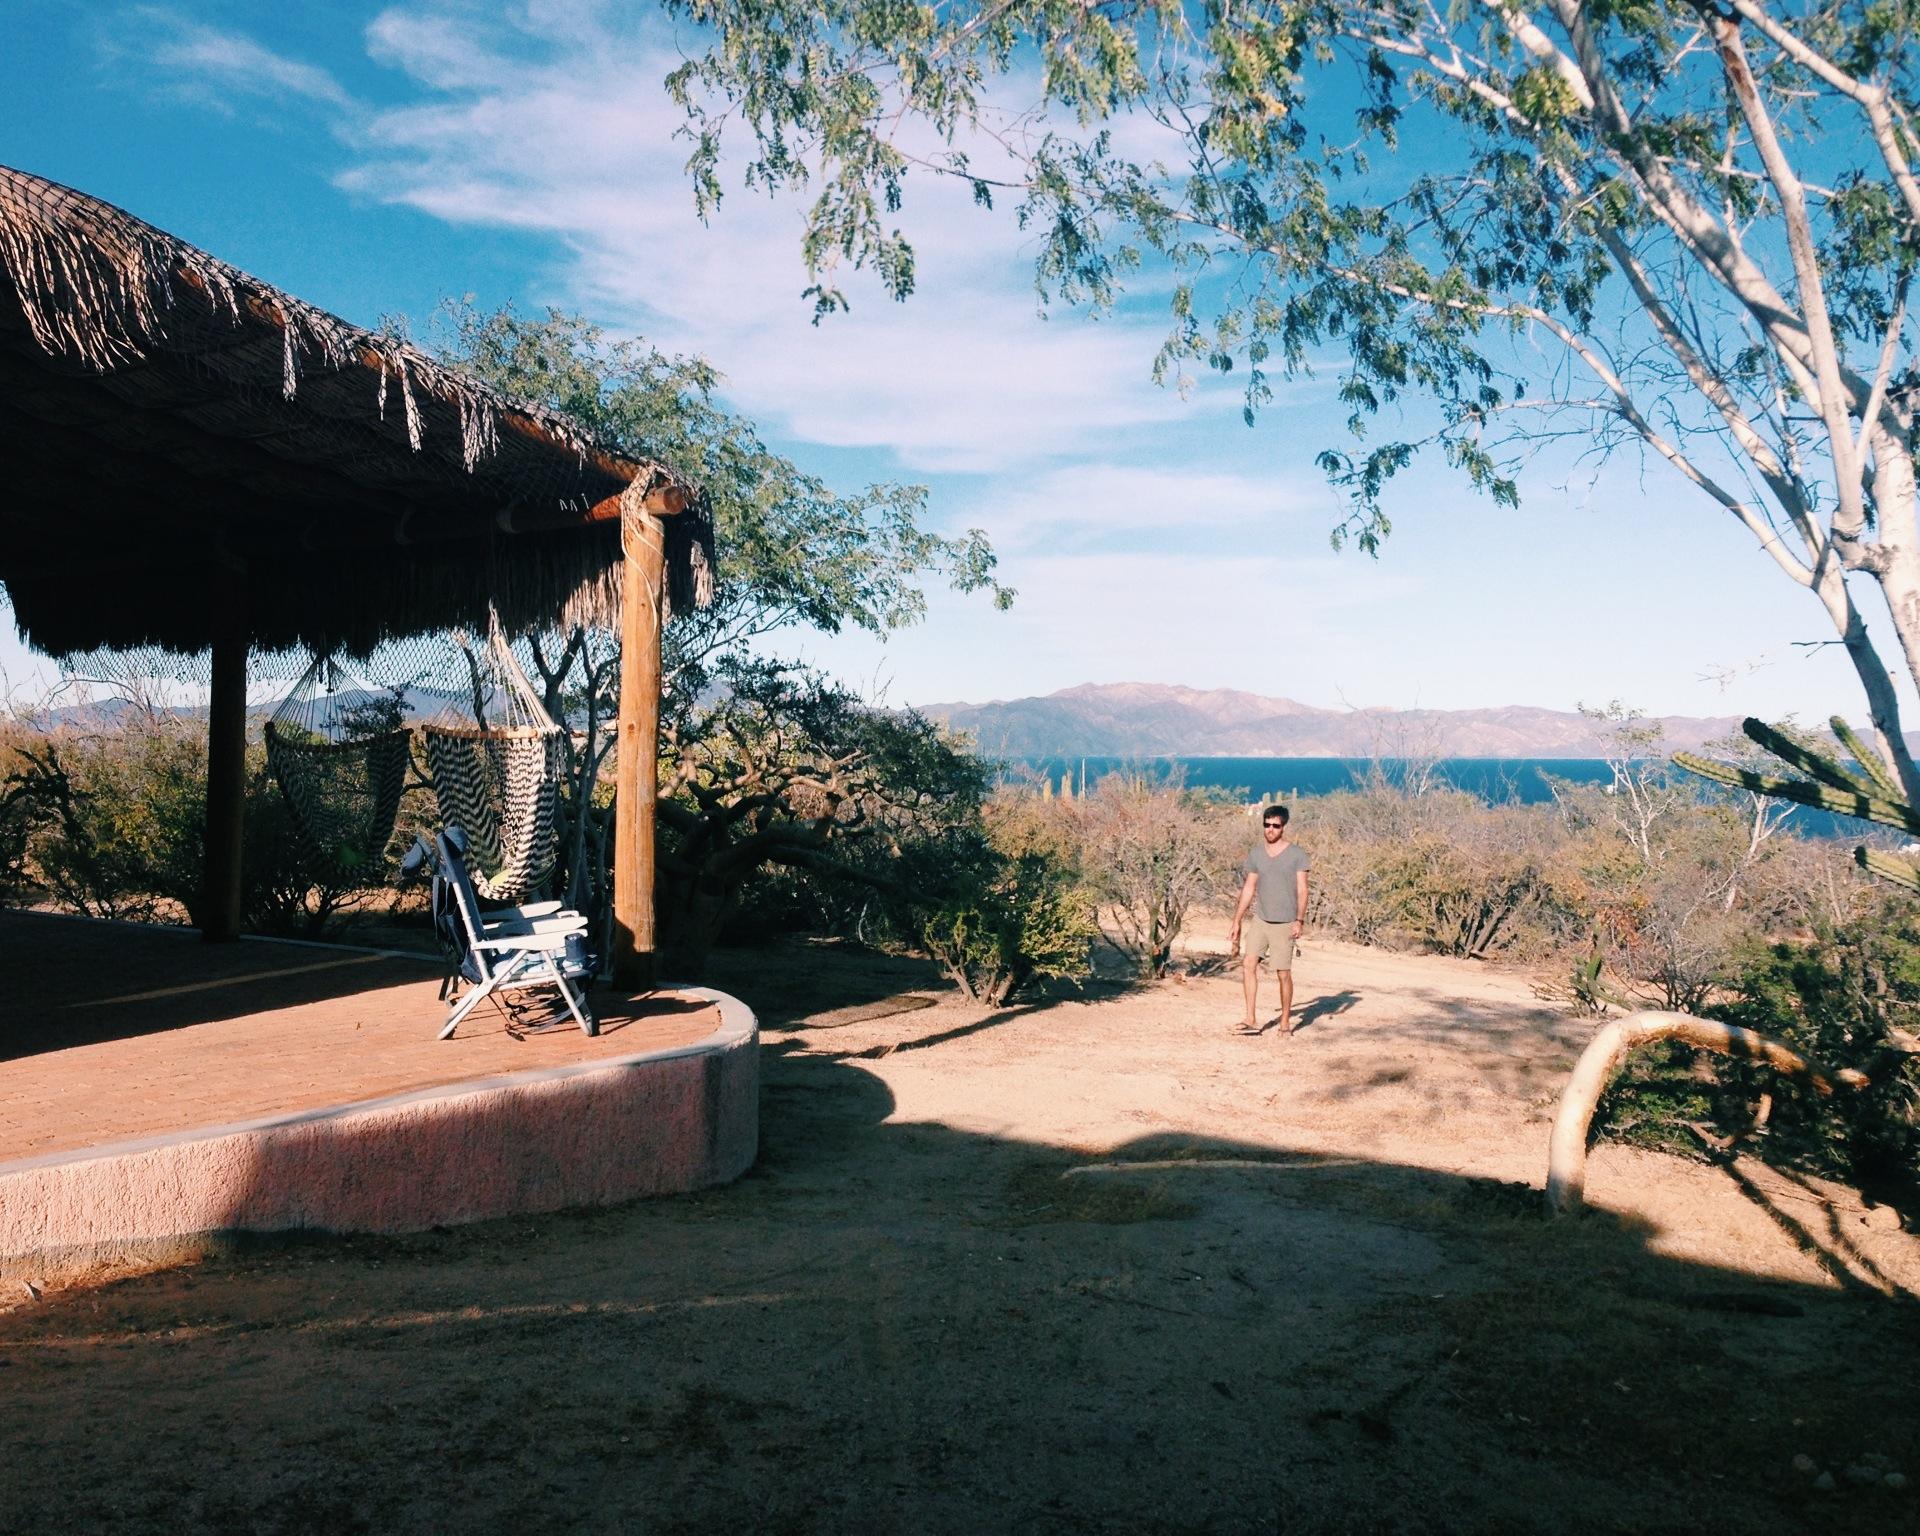 Overlooking Isla Ceralvo